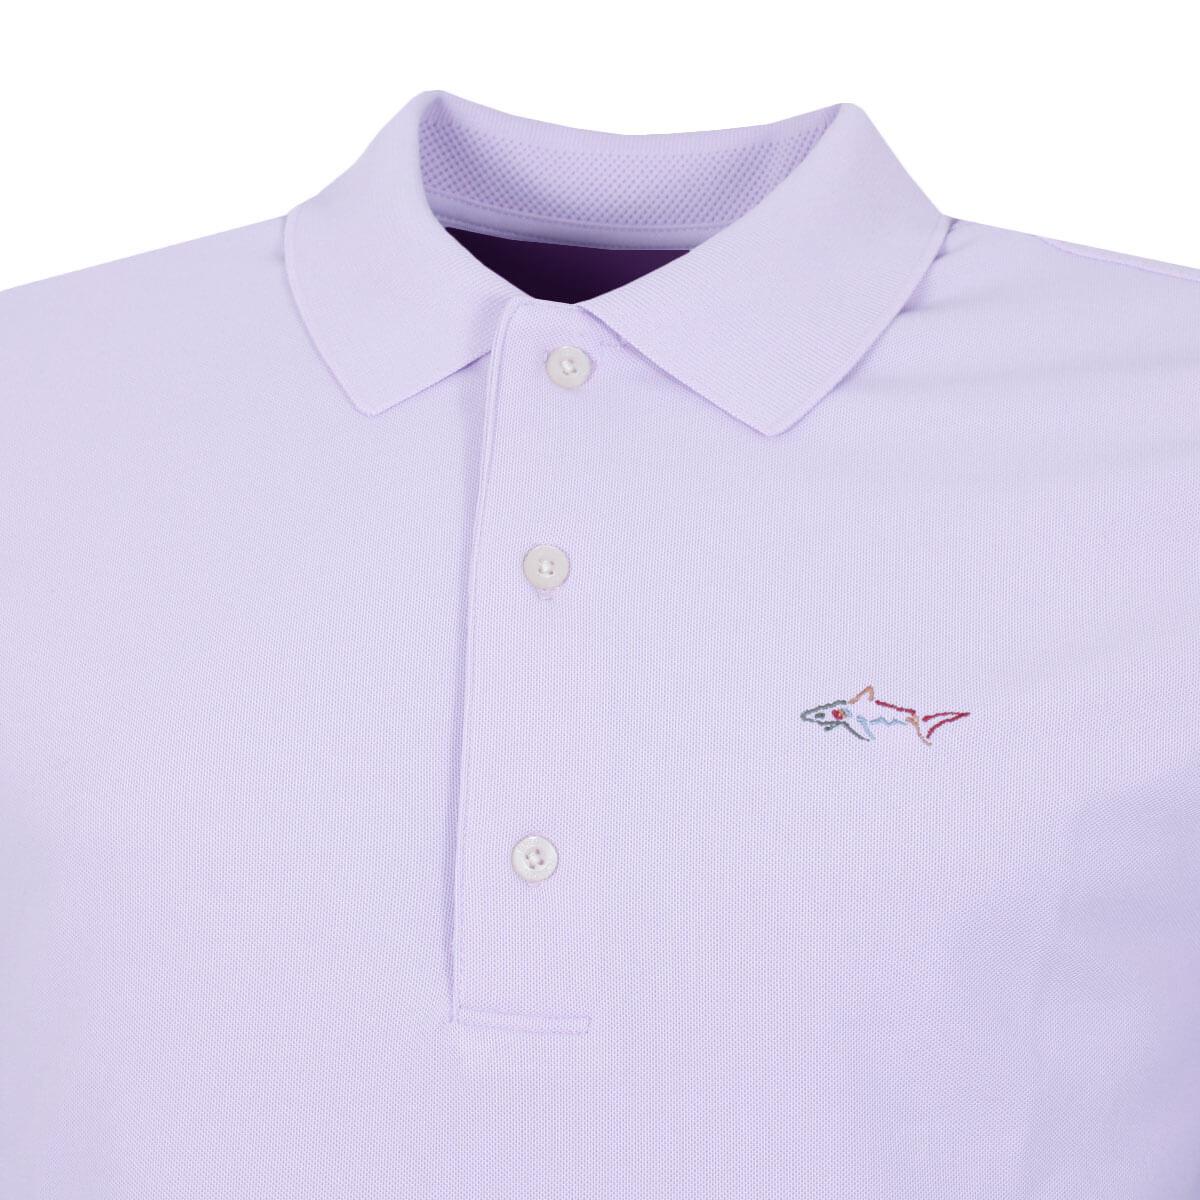 Greg-Norman-Mens-KX04-Performance-Micro-Pique-Golf-Polo-Shirt-28-OFF-RRP thumbnail 75